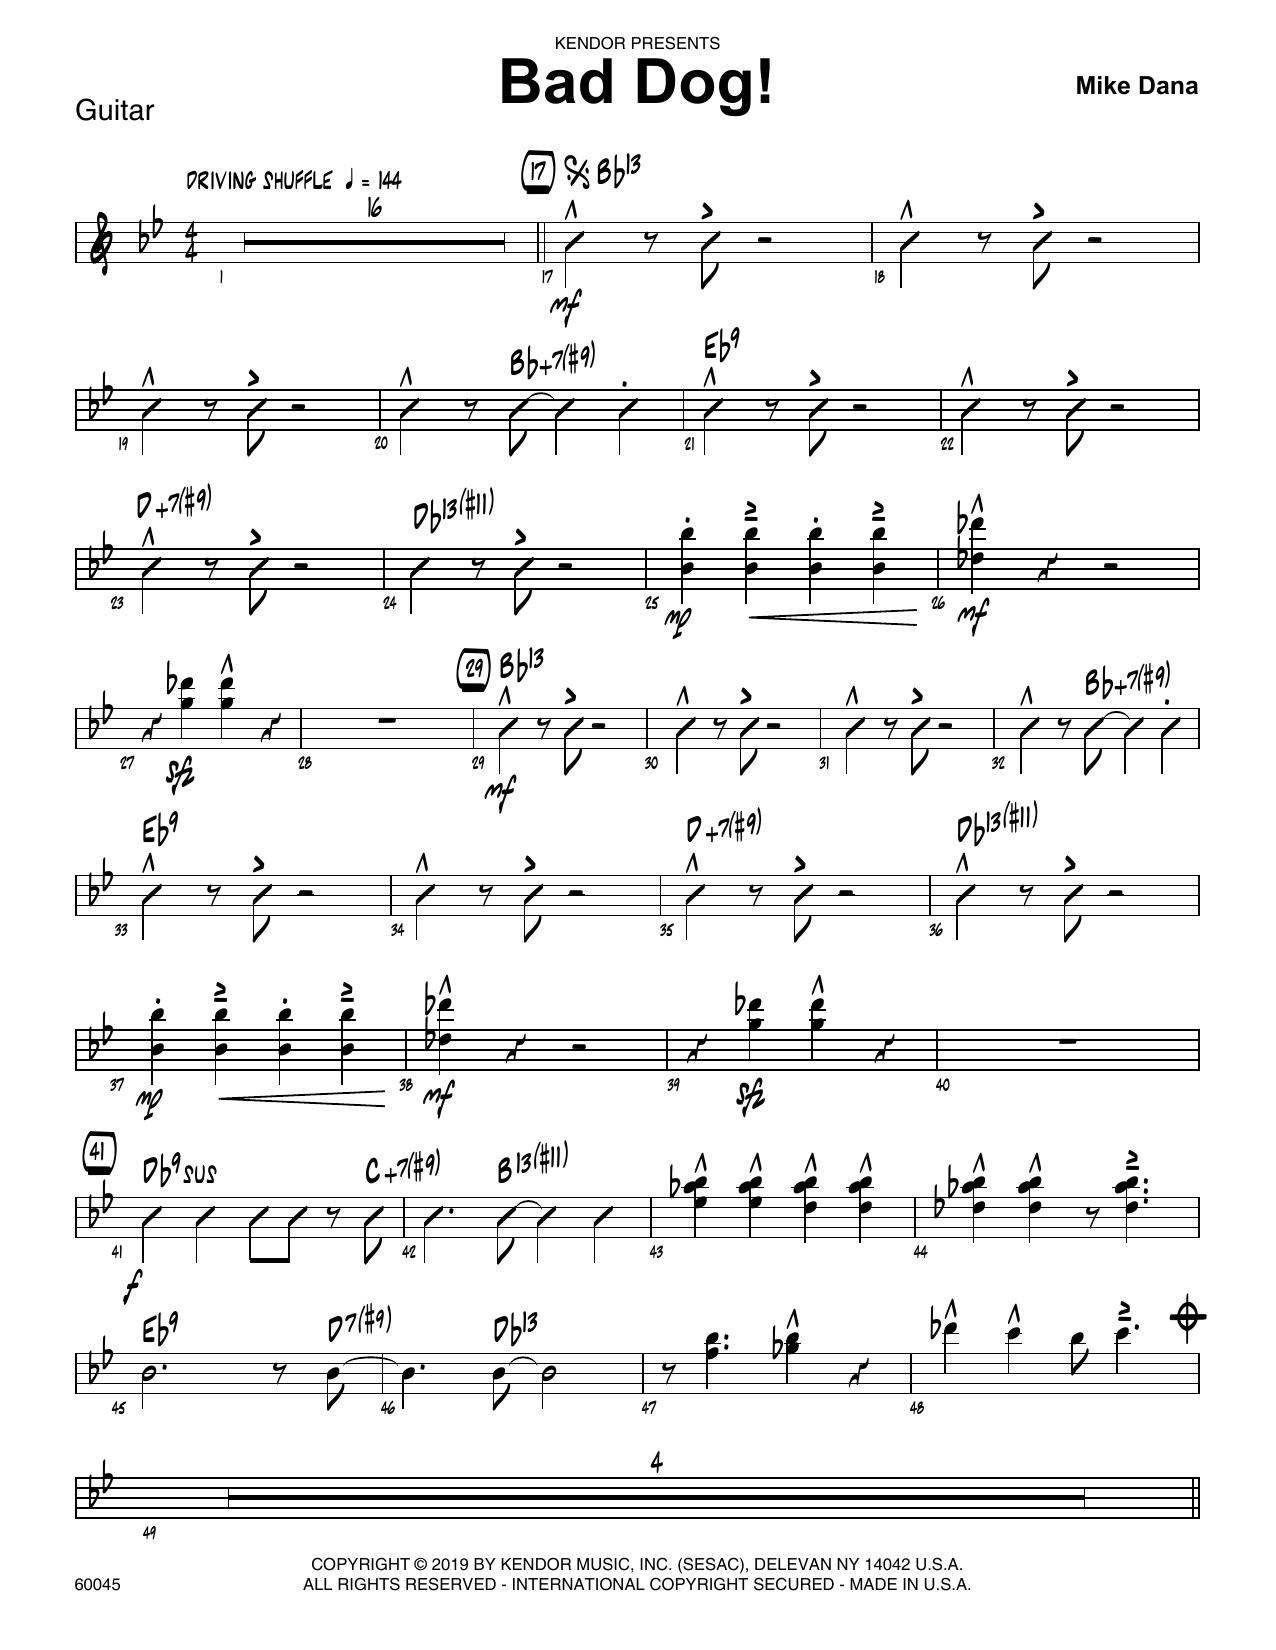 Mike Dana Bad Dog! - Guitar sheet music notes and chords. Download Printable PDF.